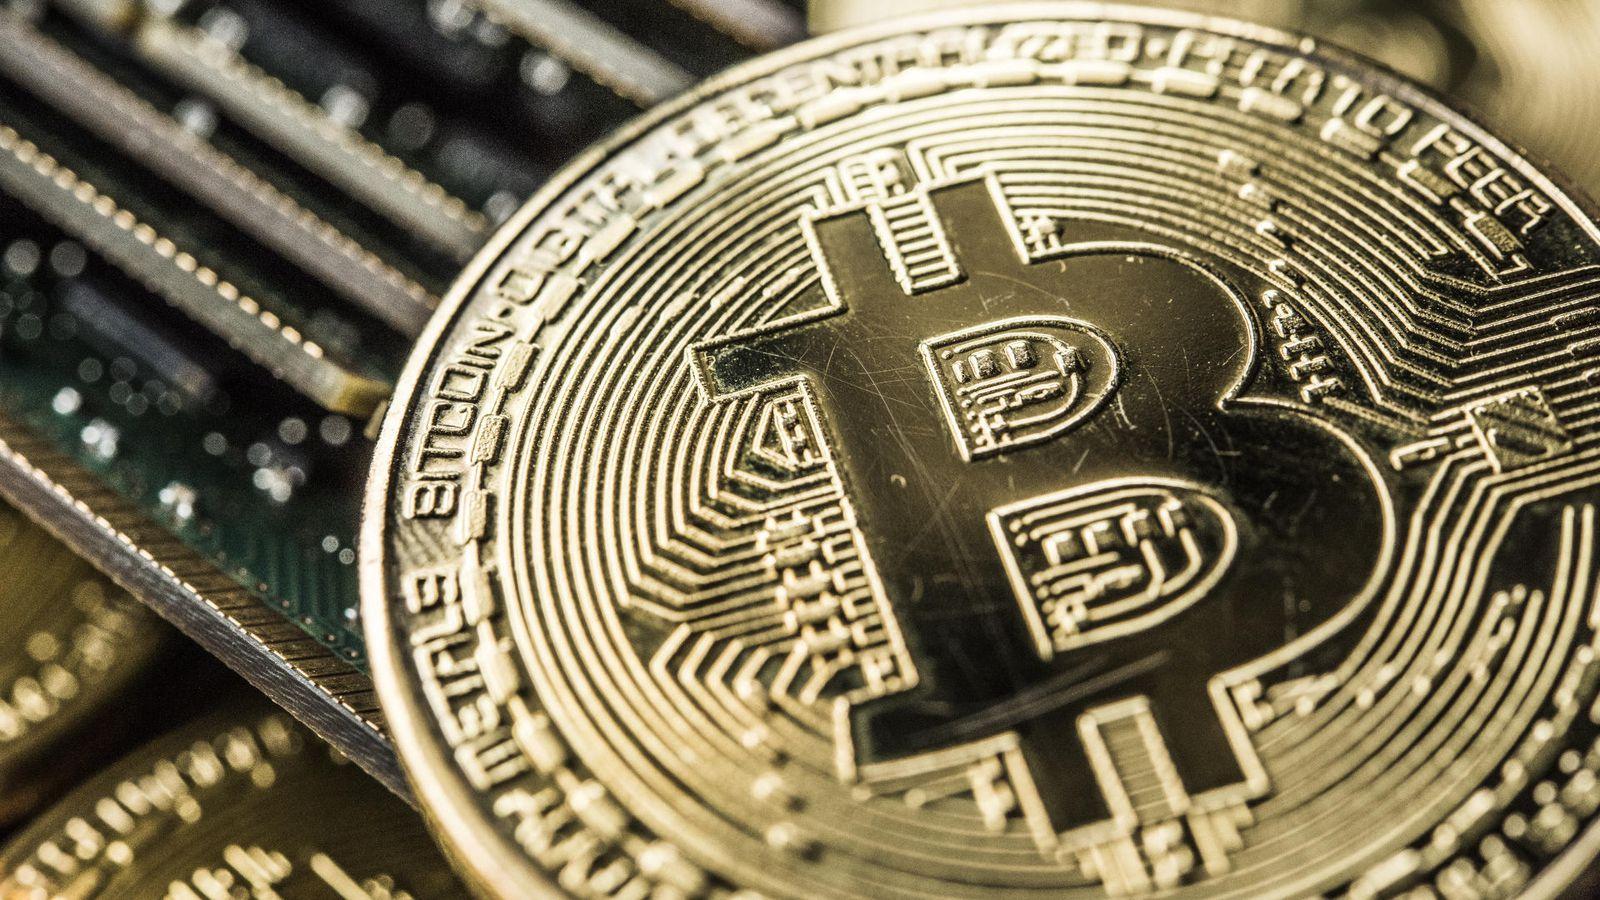 Bitcoin circuitry